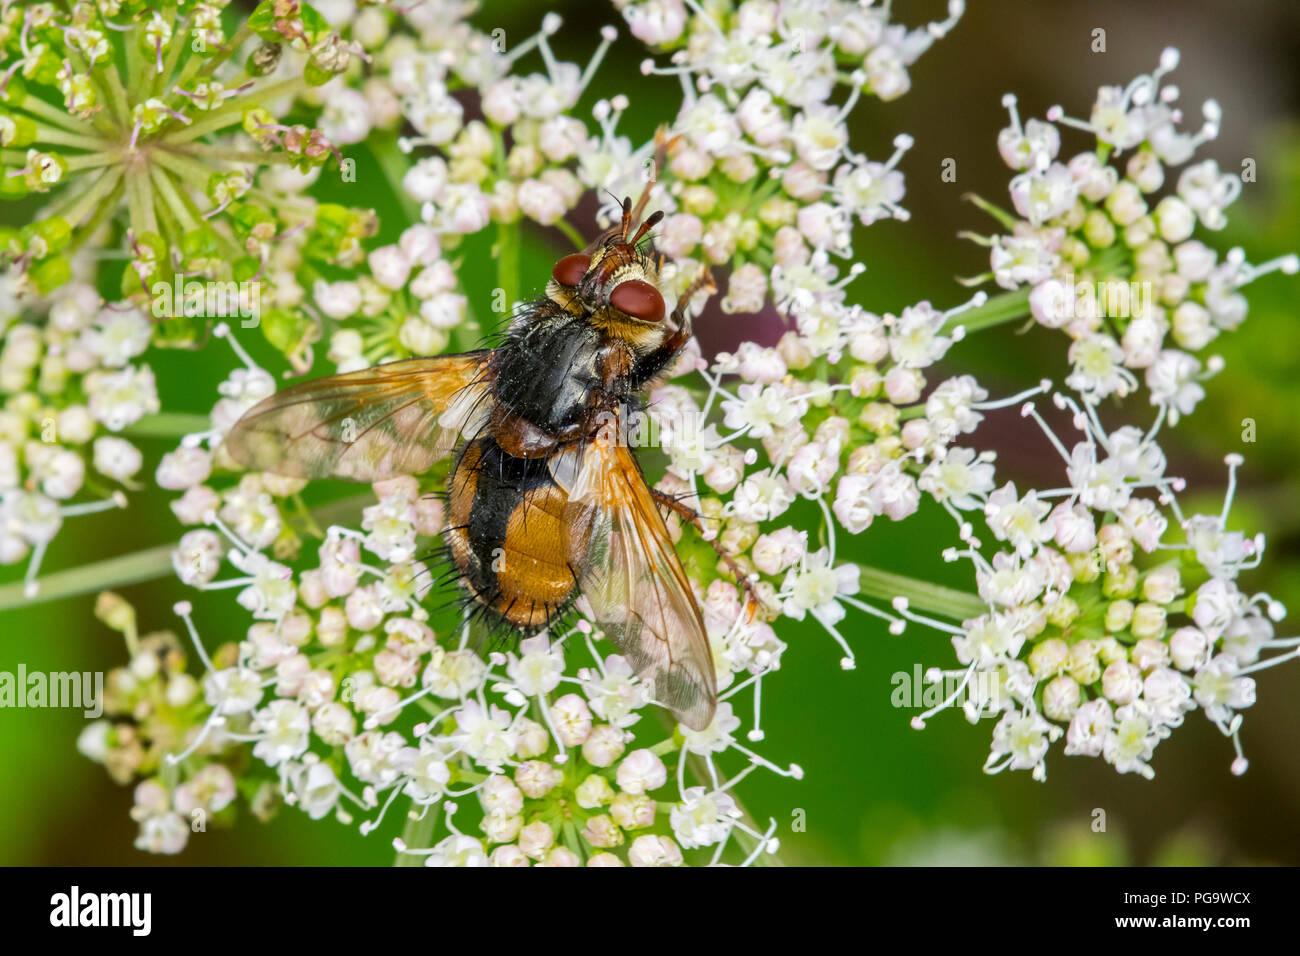 Parasit Fly/tachinid Fly/Tachina fera Fütterung auf Nektar von umbellifer Blume im Sommer Stockbild